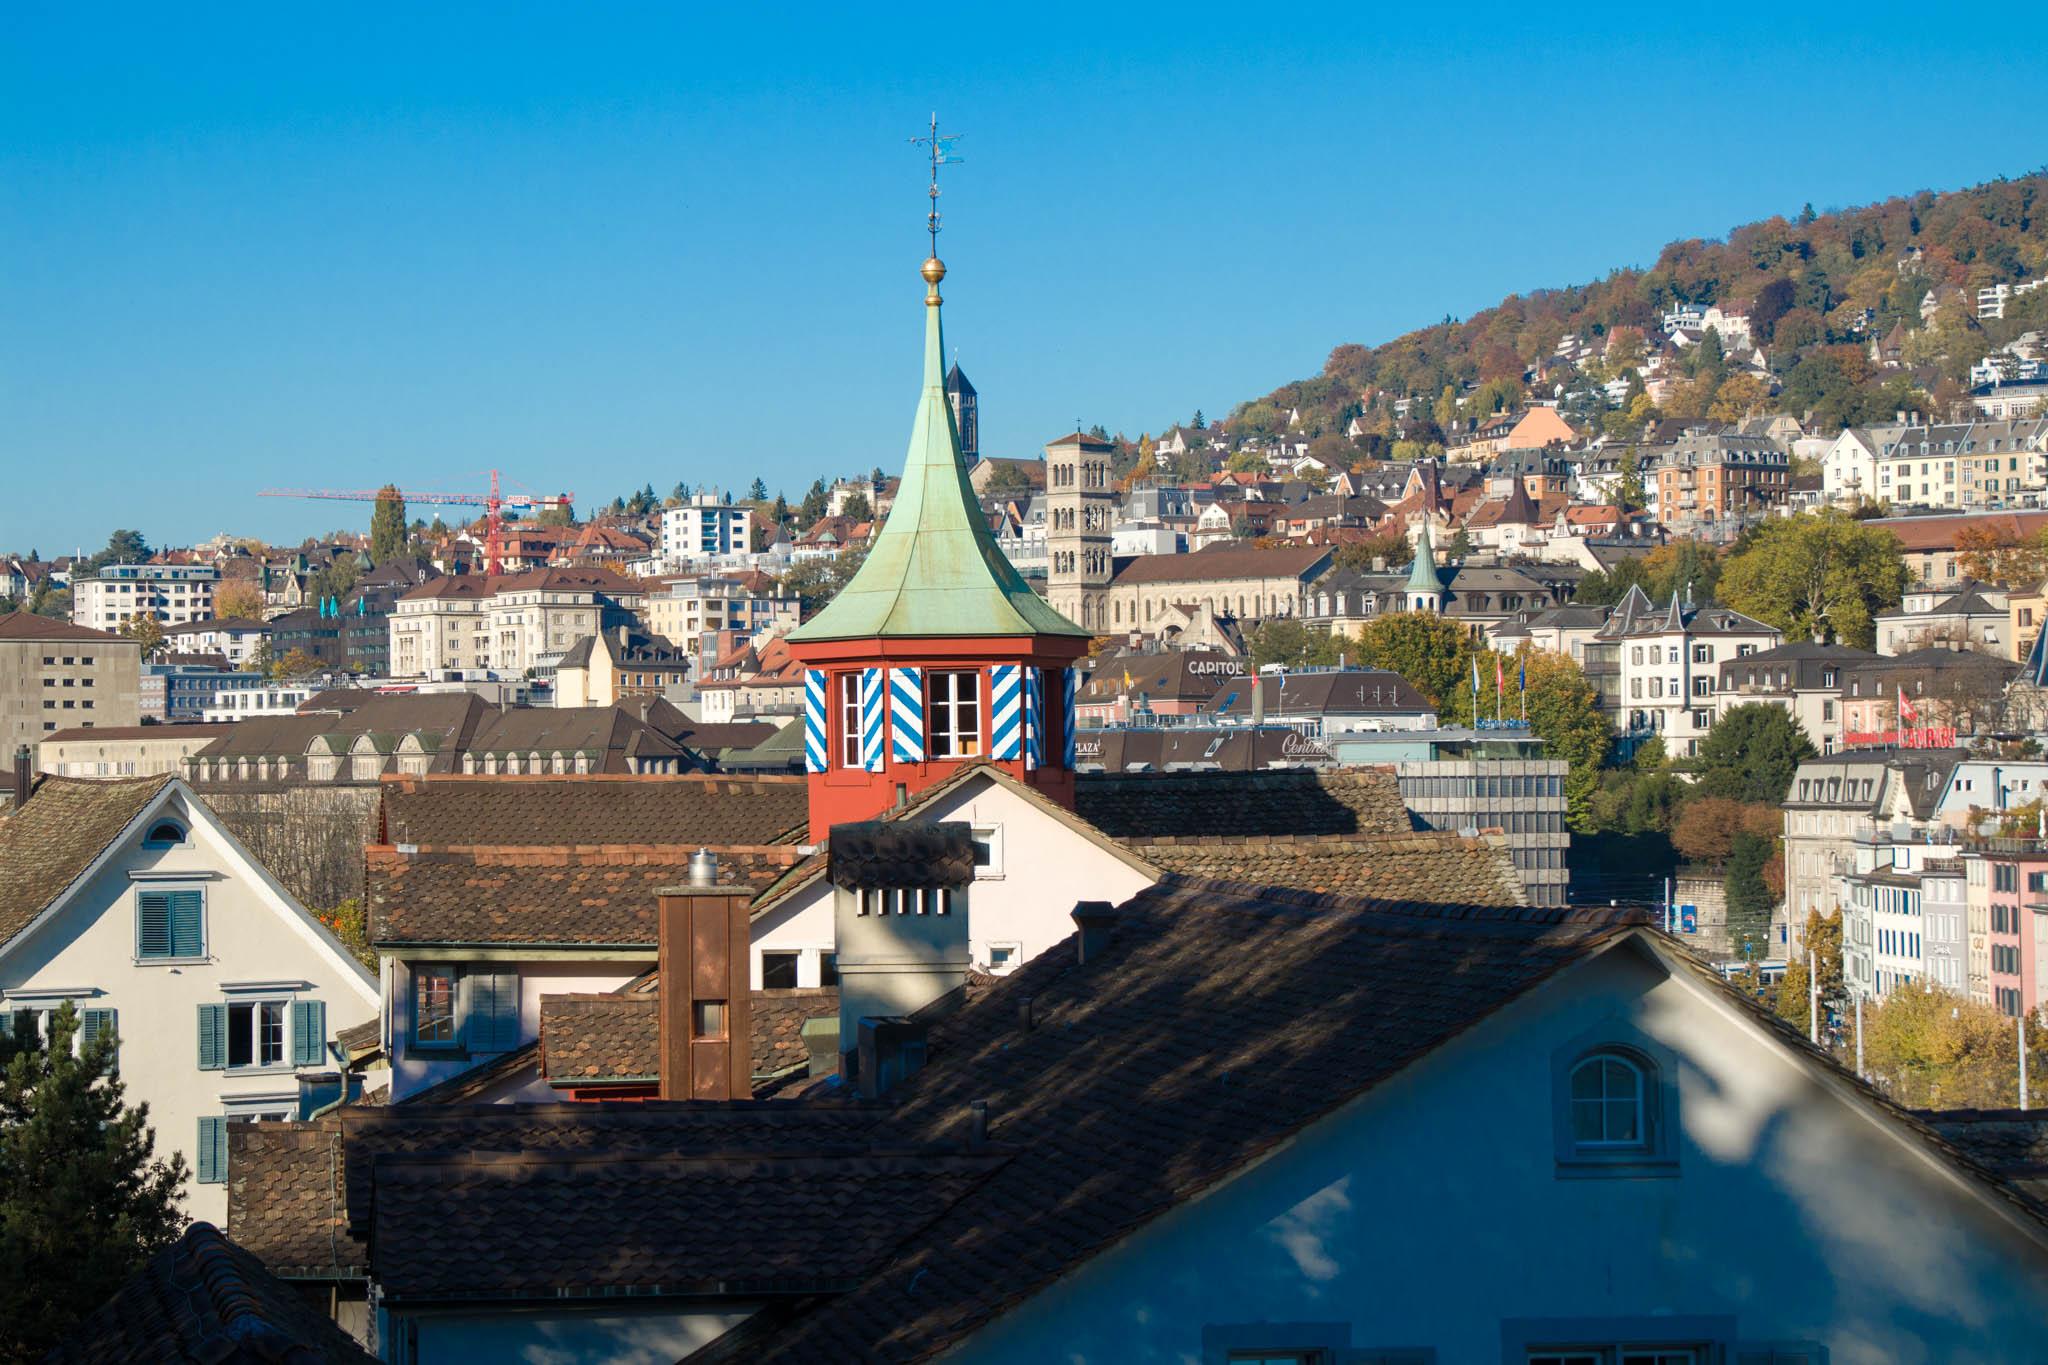 Zürich Oct 2017